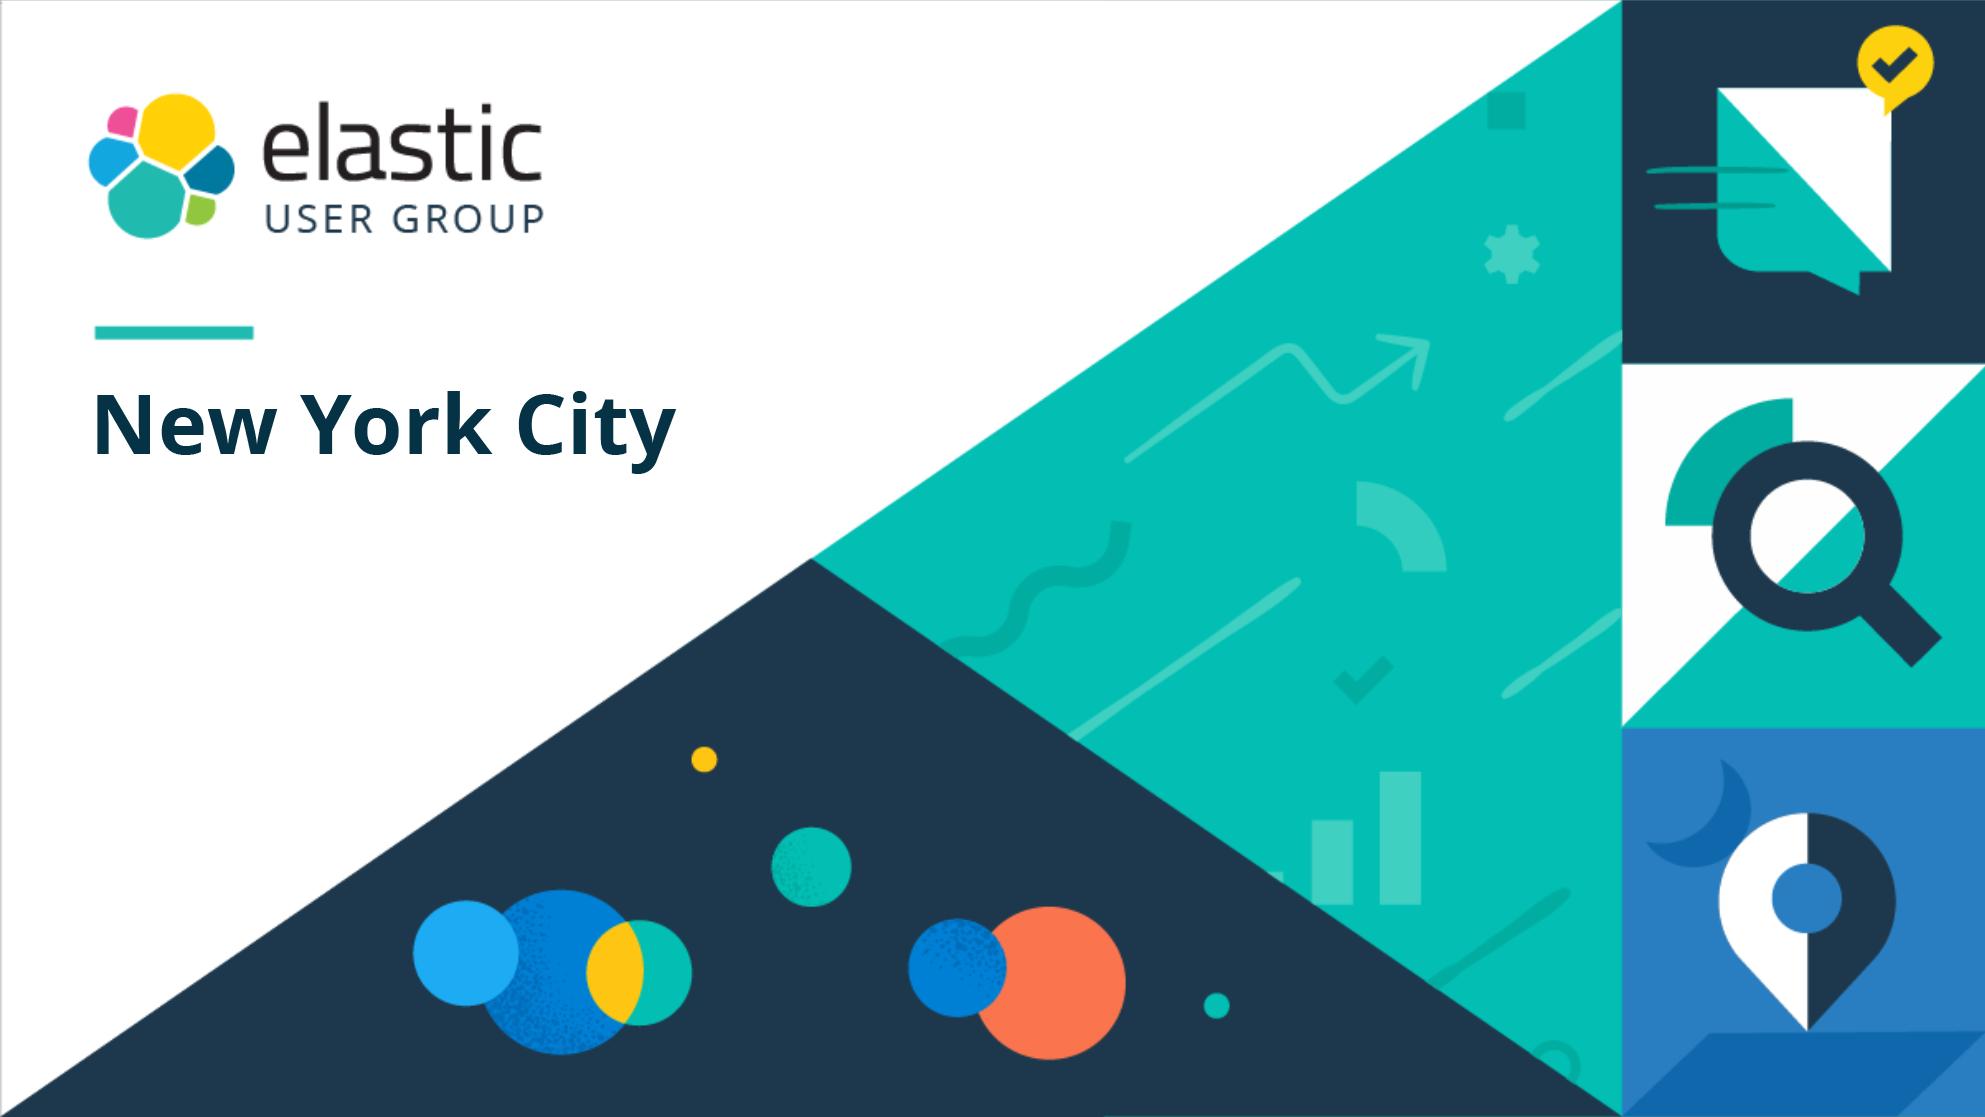 Elastic New York City User Group